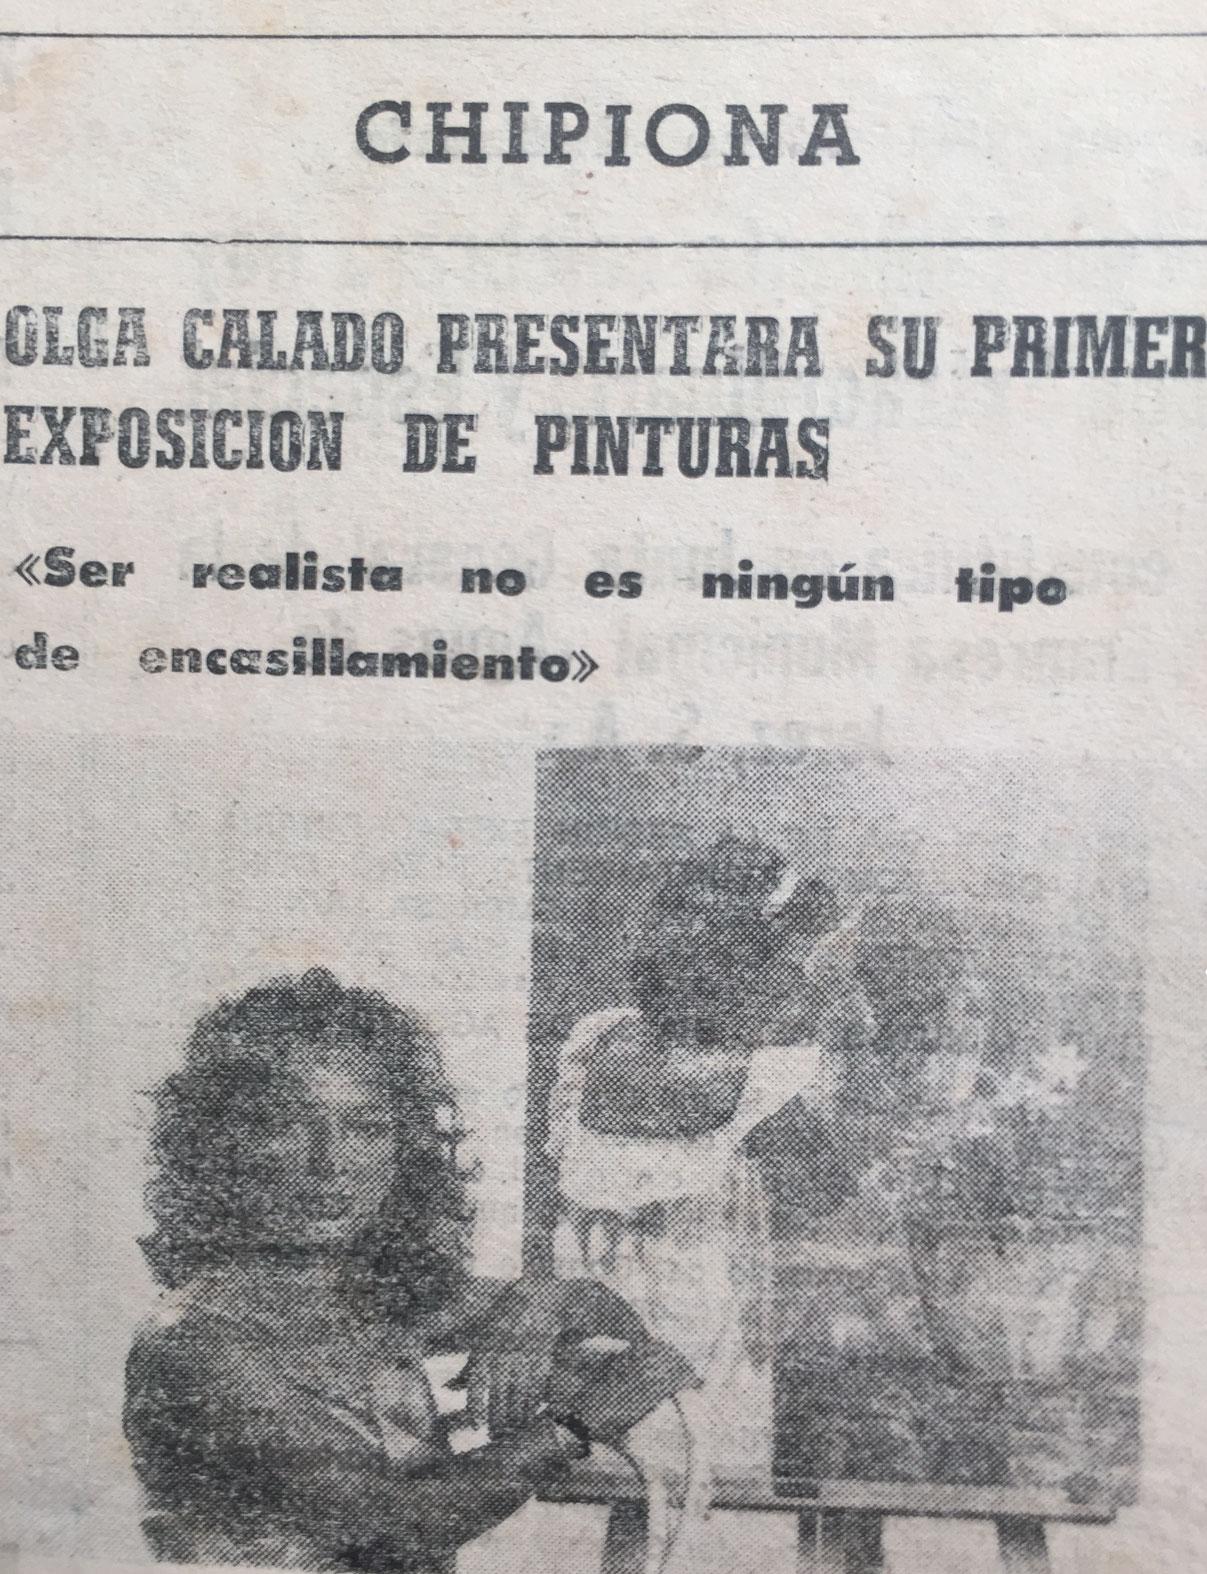 Photo Interview First Exhibition Olga Calado